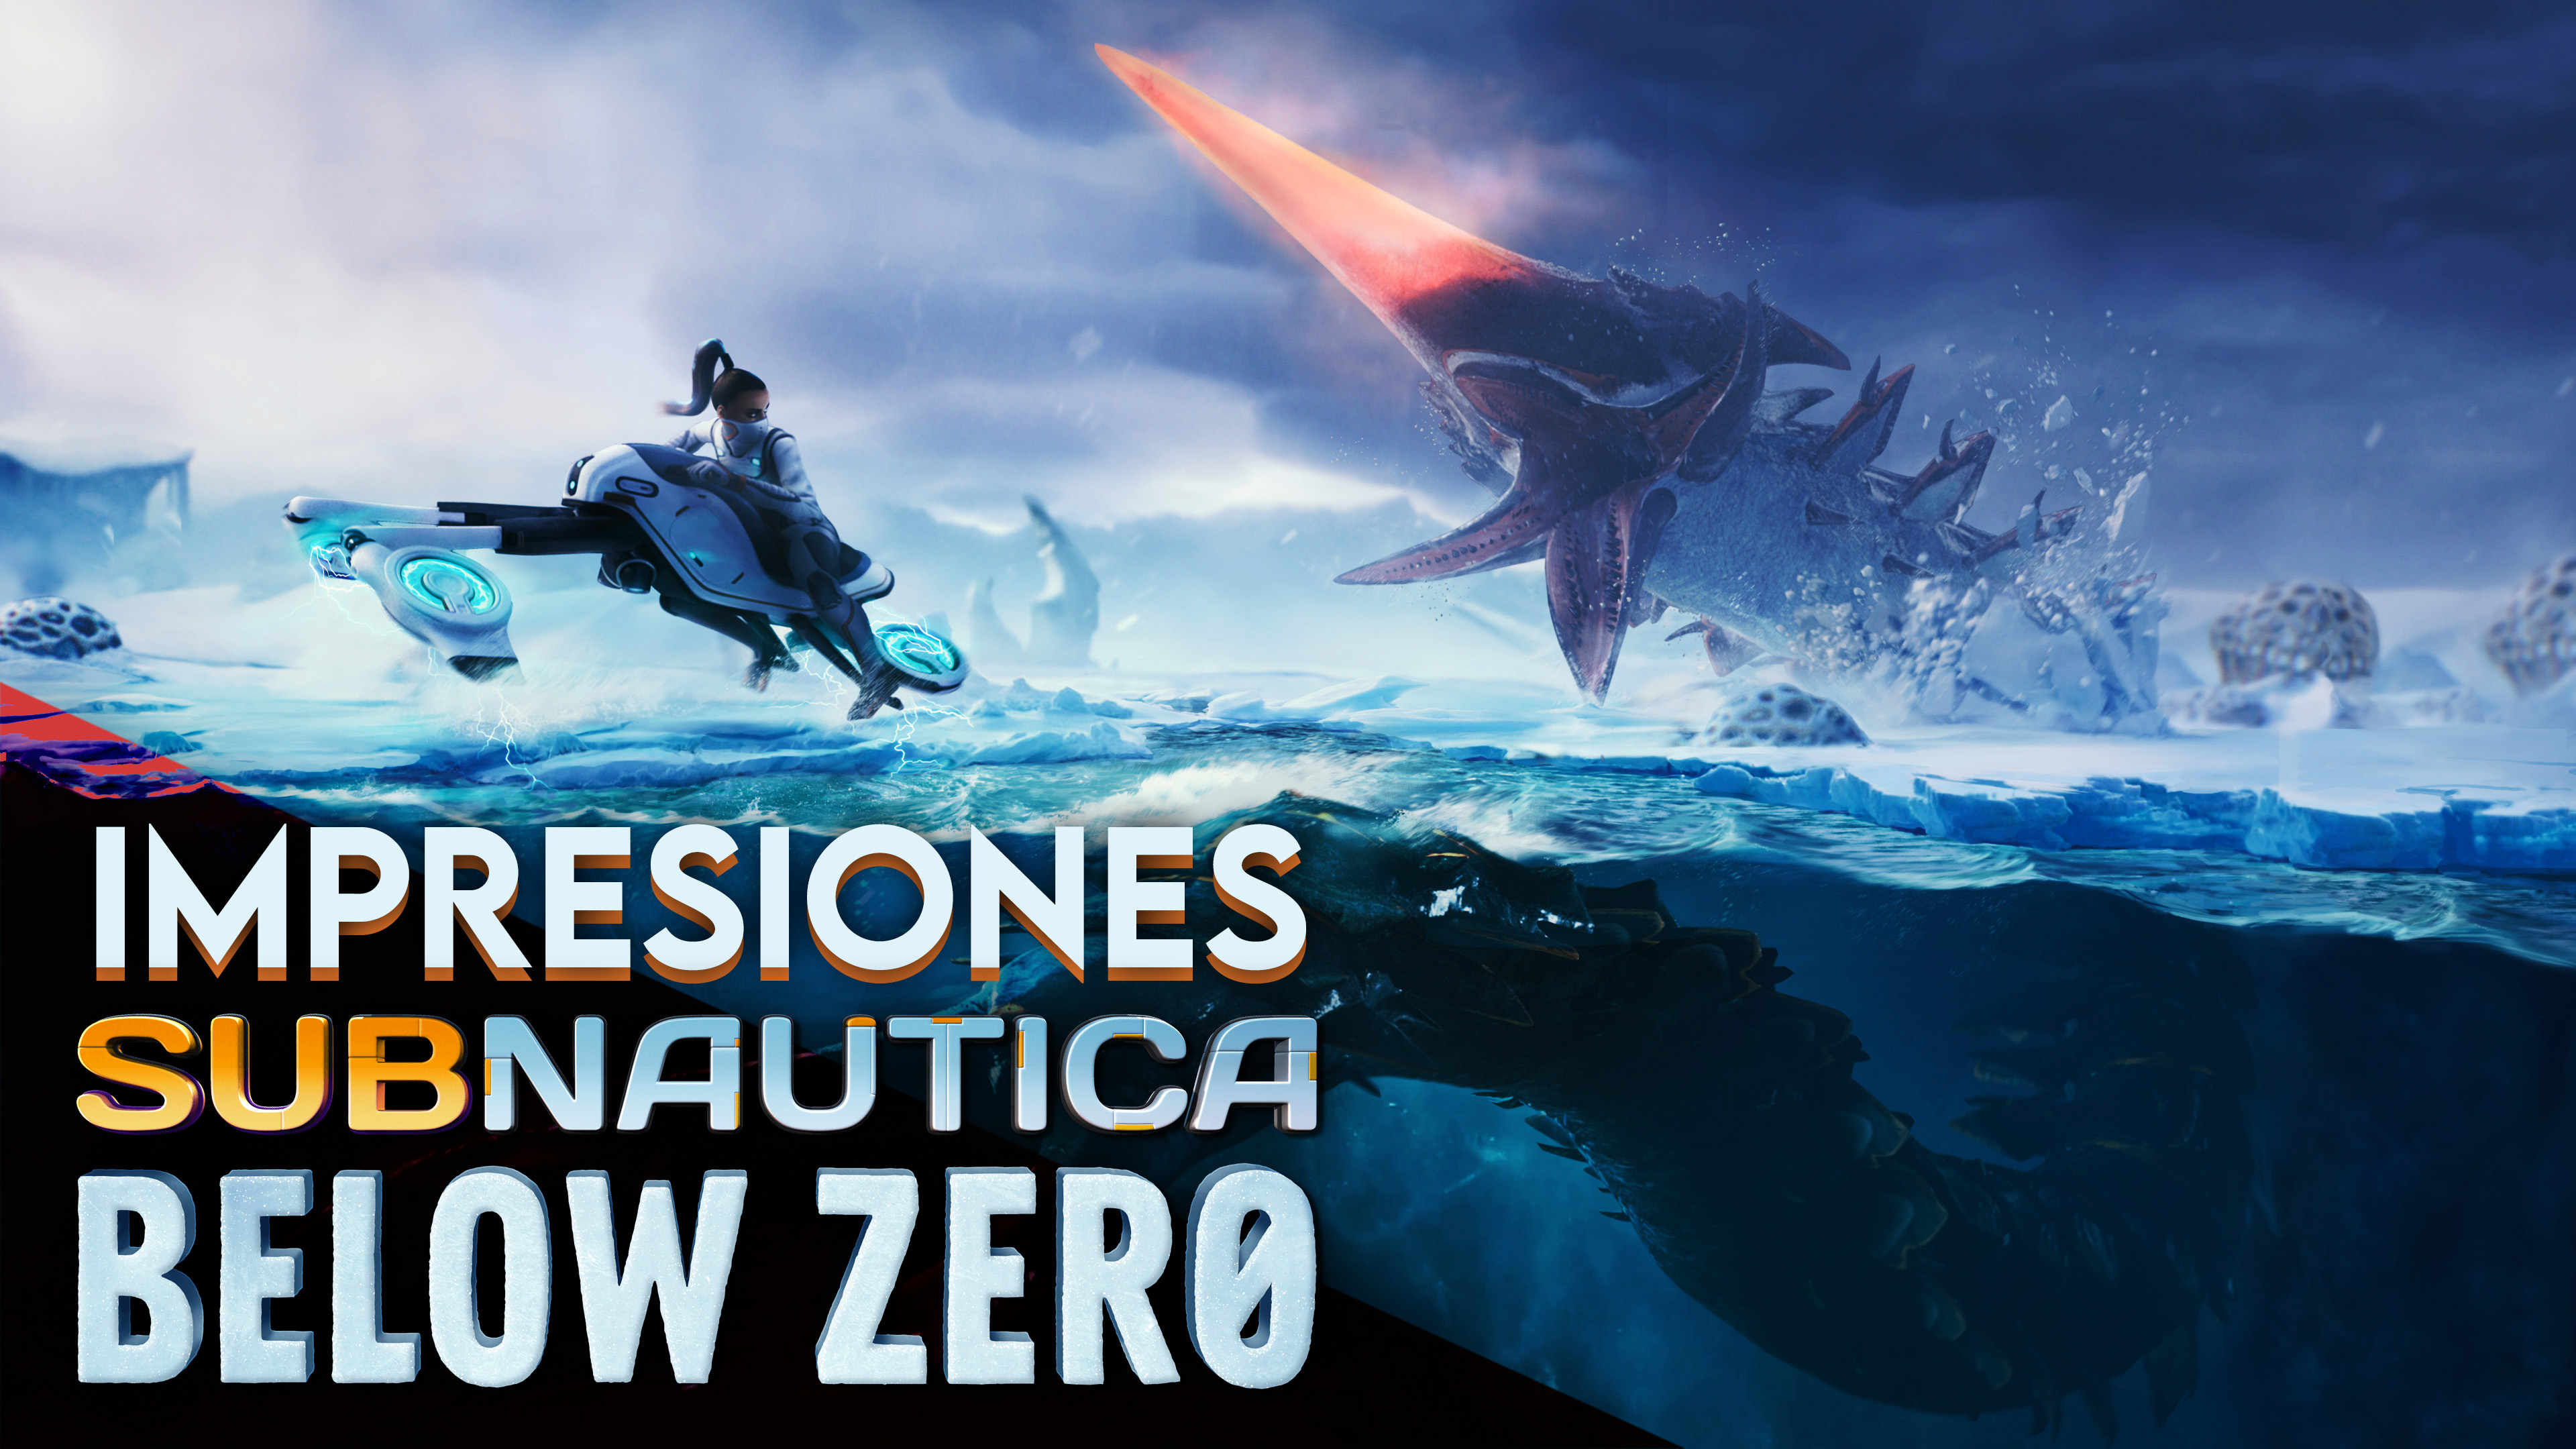 Impresiones Subnautica: Below Zero